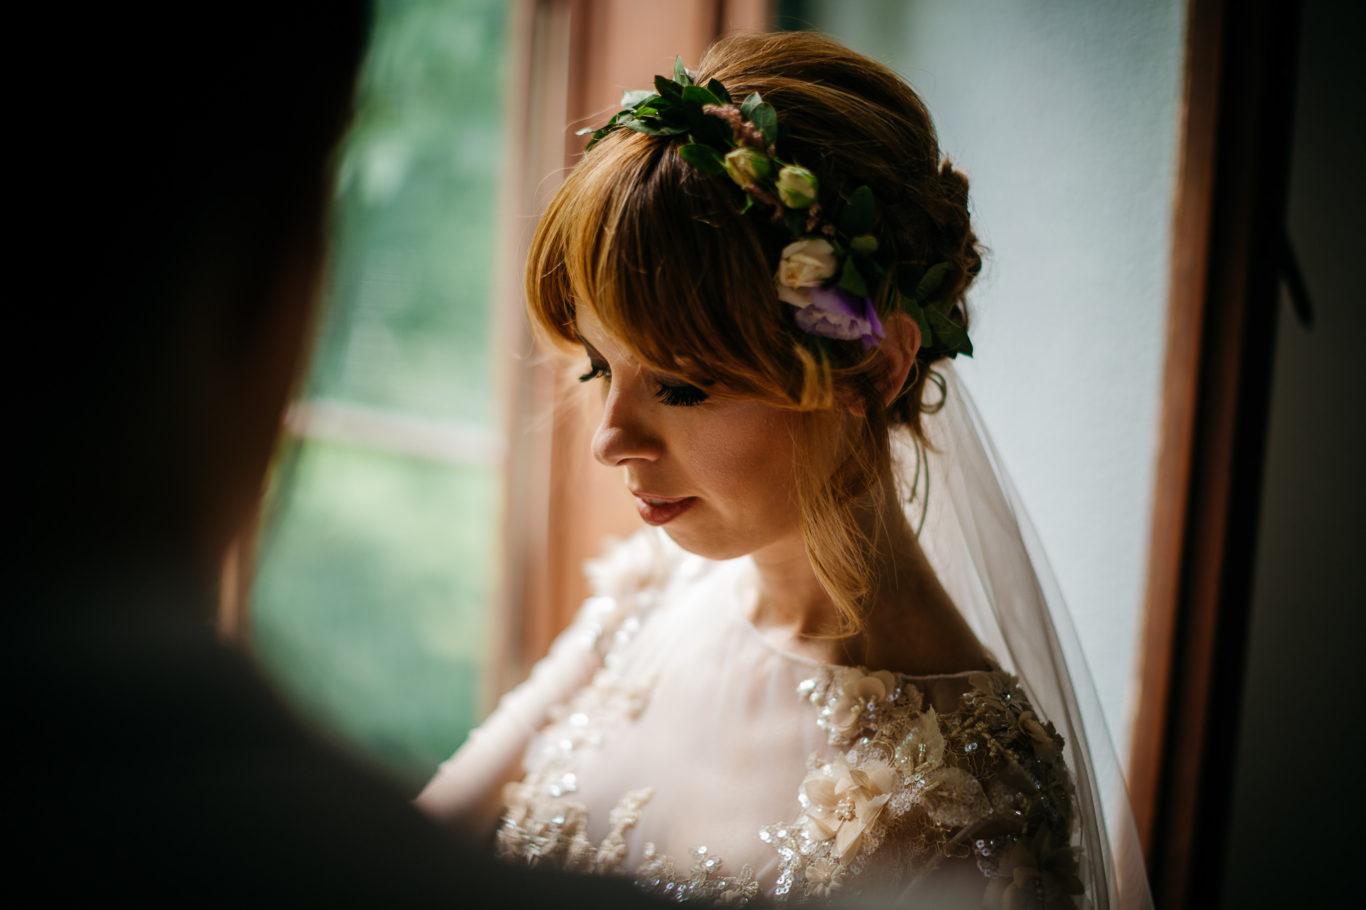 0124-Fotografie-nunta-Stirbey-Laura-Rares-fotograf-Ciprian-Dumitrescu-CDF_0013 (2)